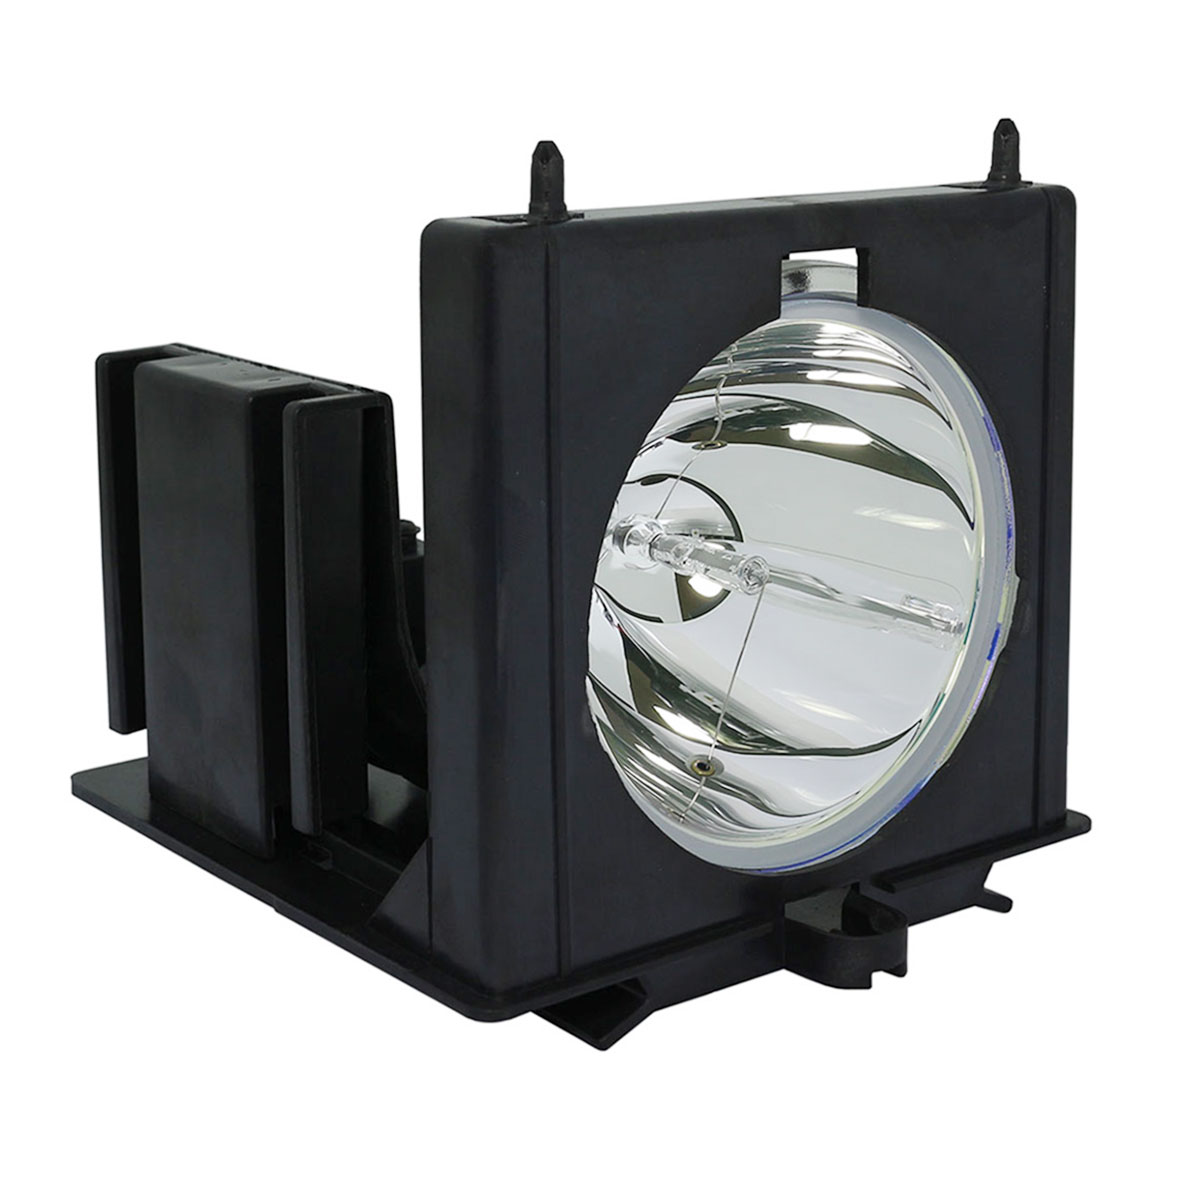 Lutema Platinum for RCA HD61LPW42YX6 TV Lamp with Housing (Original Philips Bulb Inside) - image 4 of 5